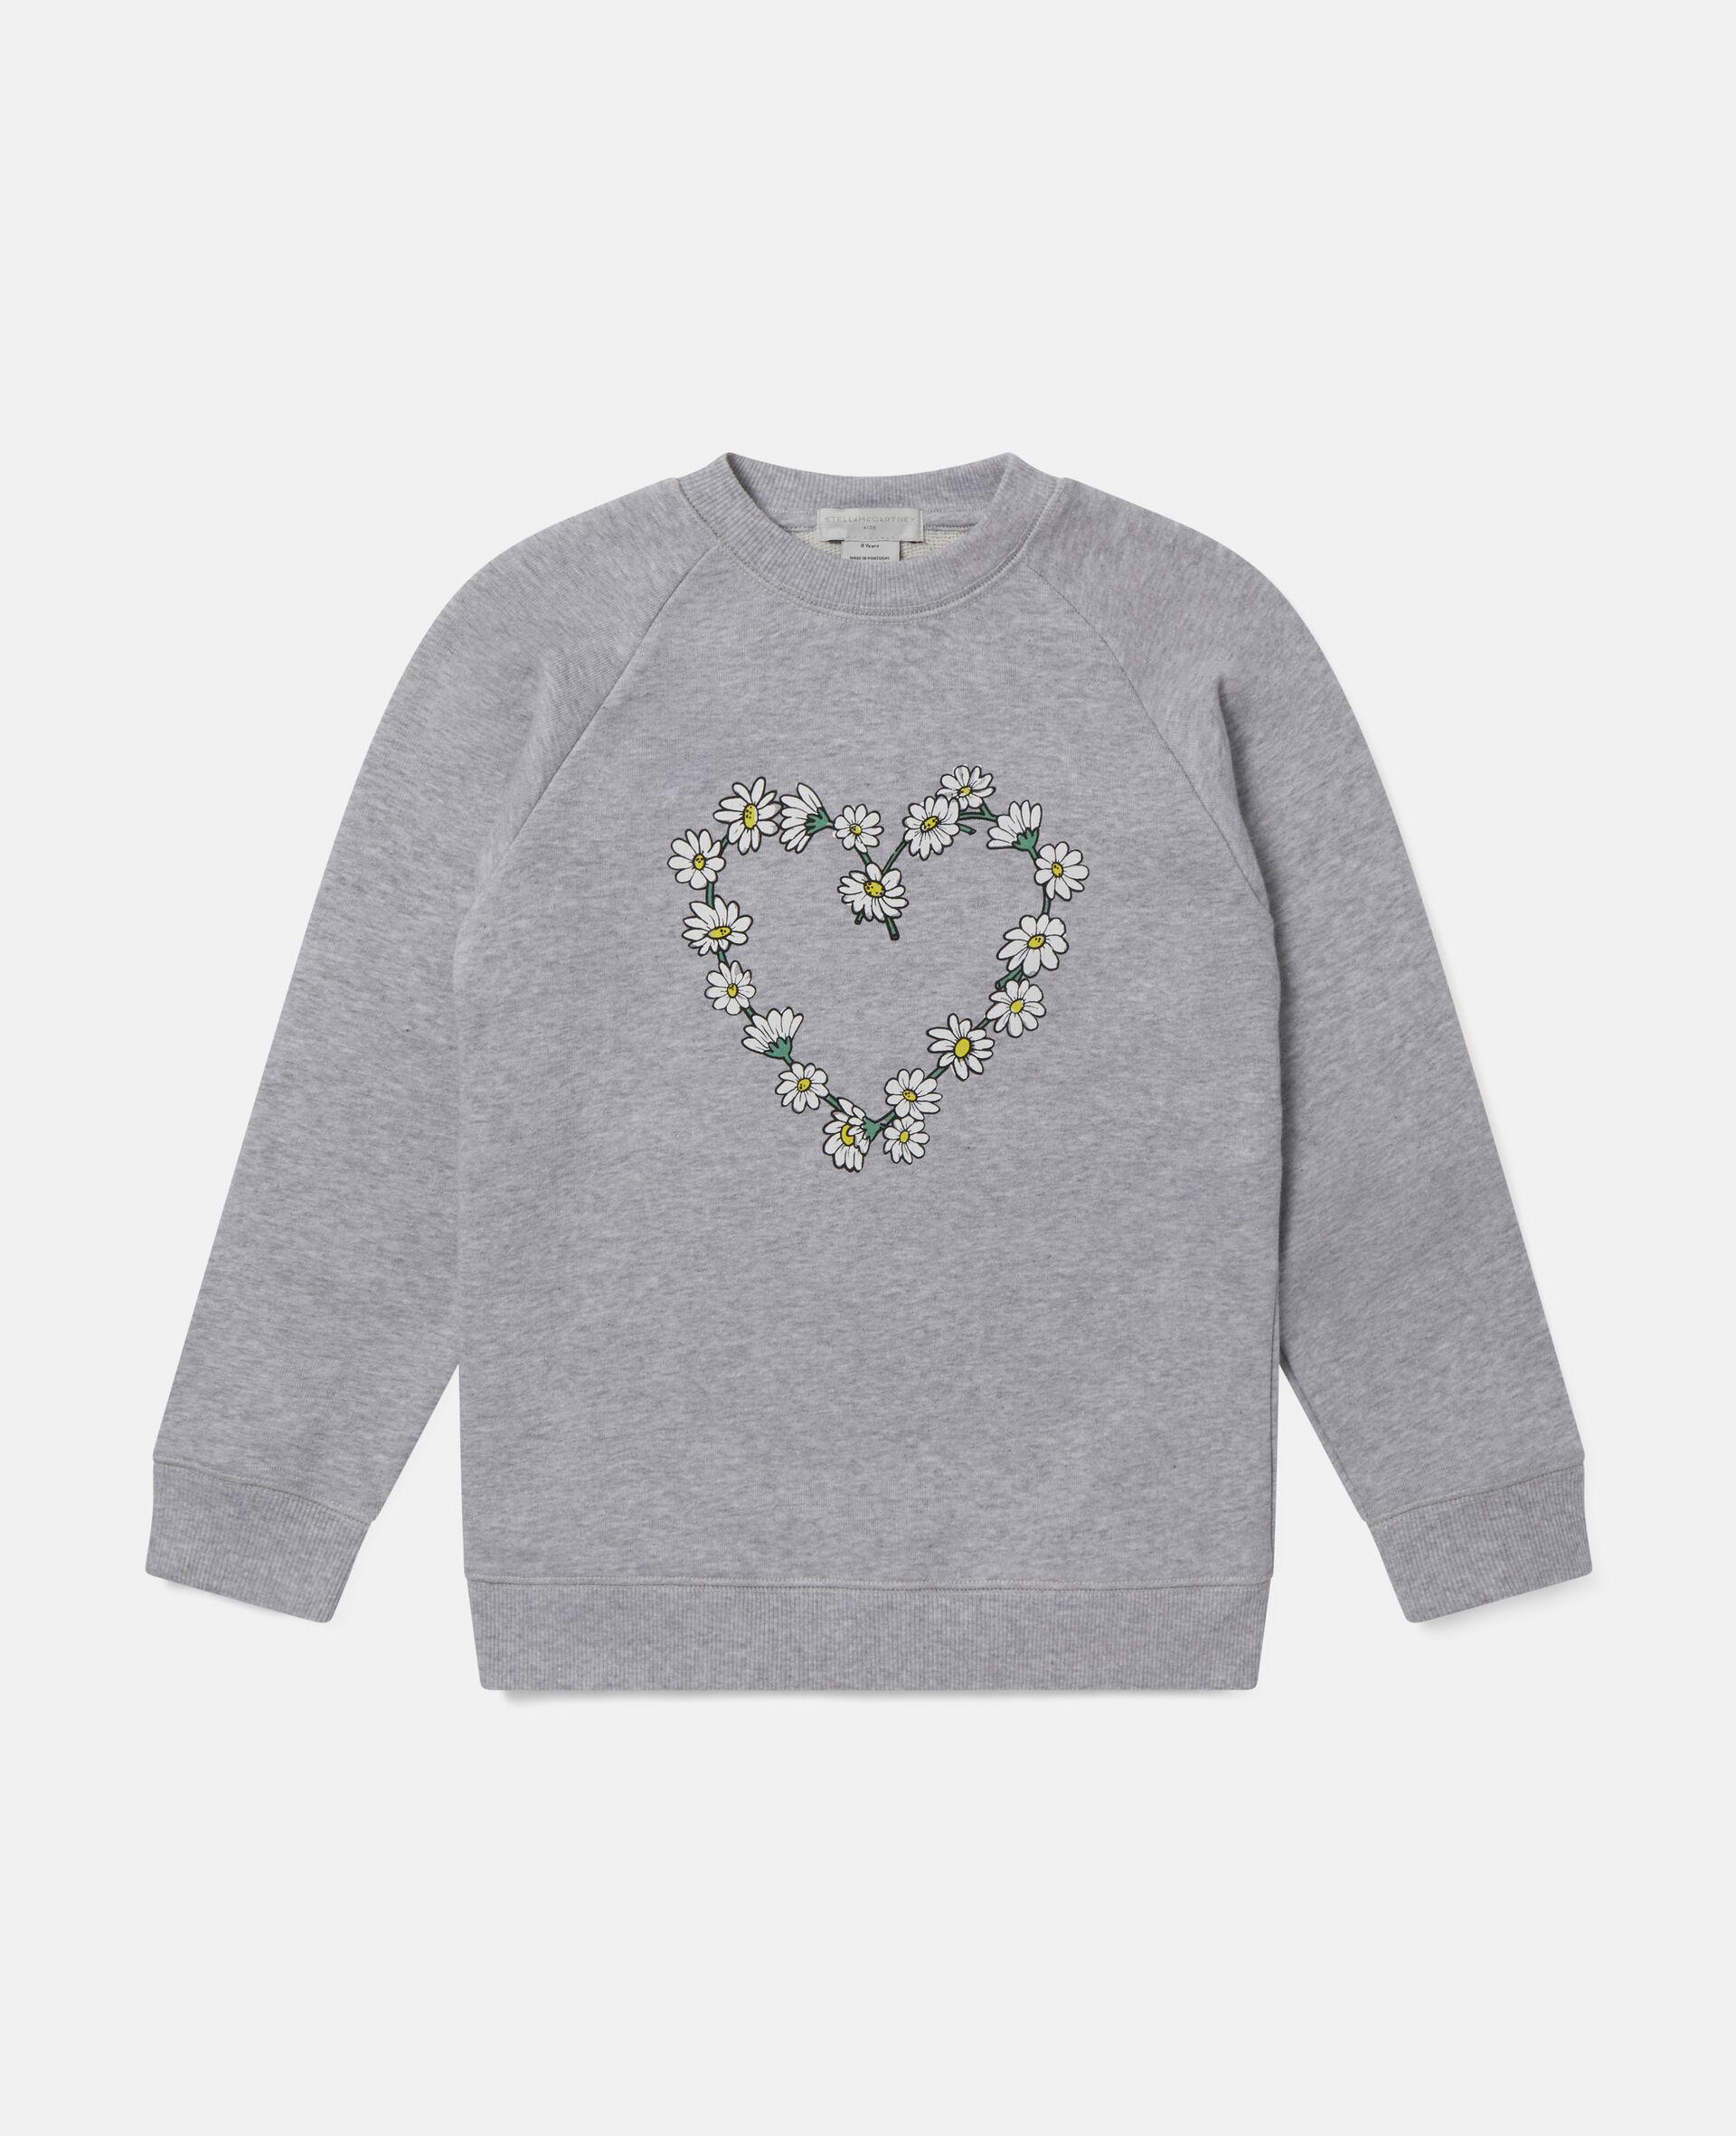 Daisy Heart Cotton Fleece Sweatshirt -Grey-large image number 0